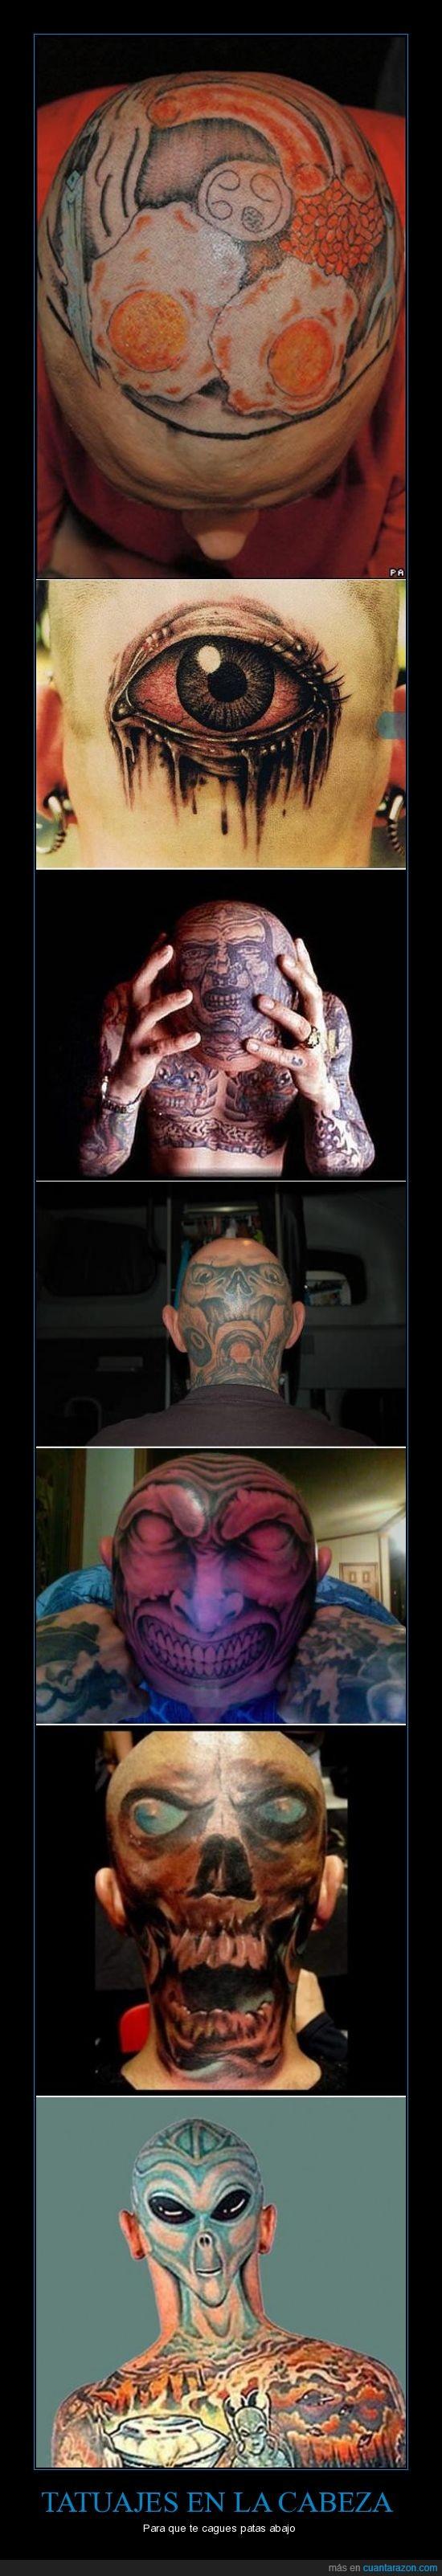 cabeza,calavera,calva,inquietante,ovni,tatoo,tatuaje